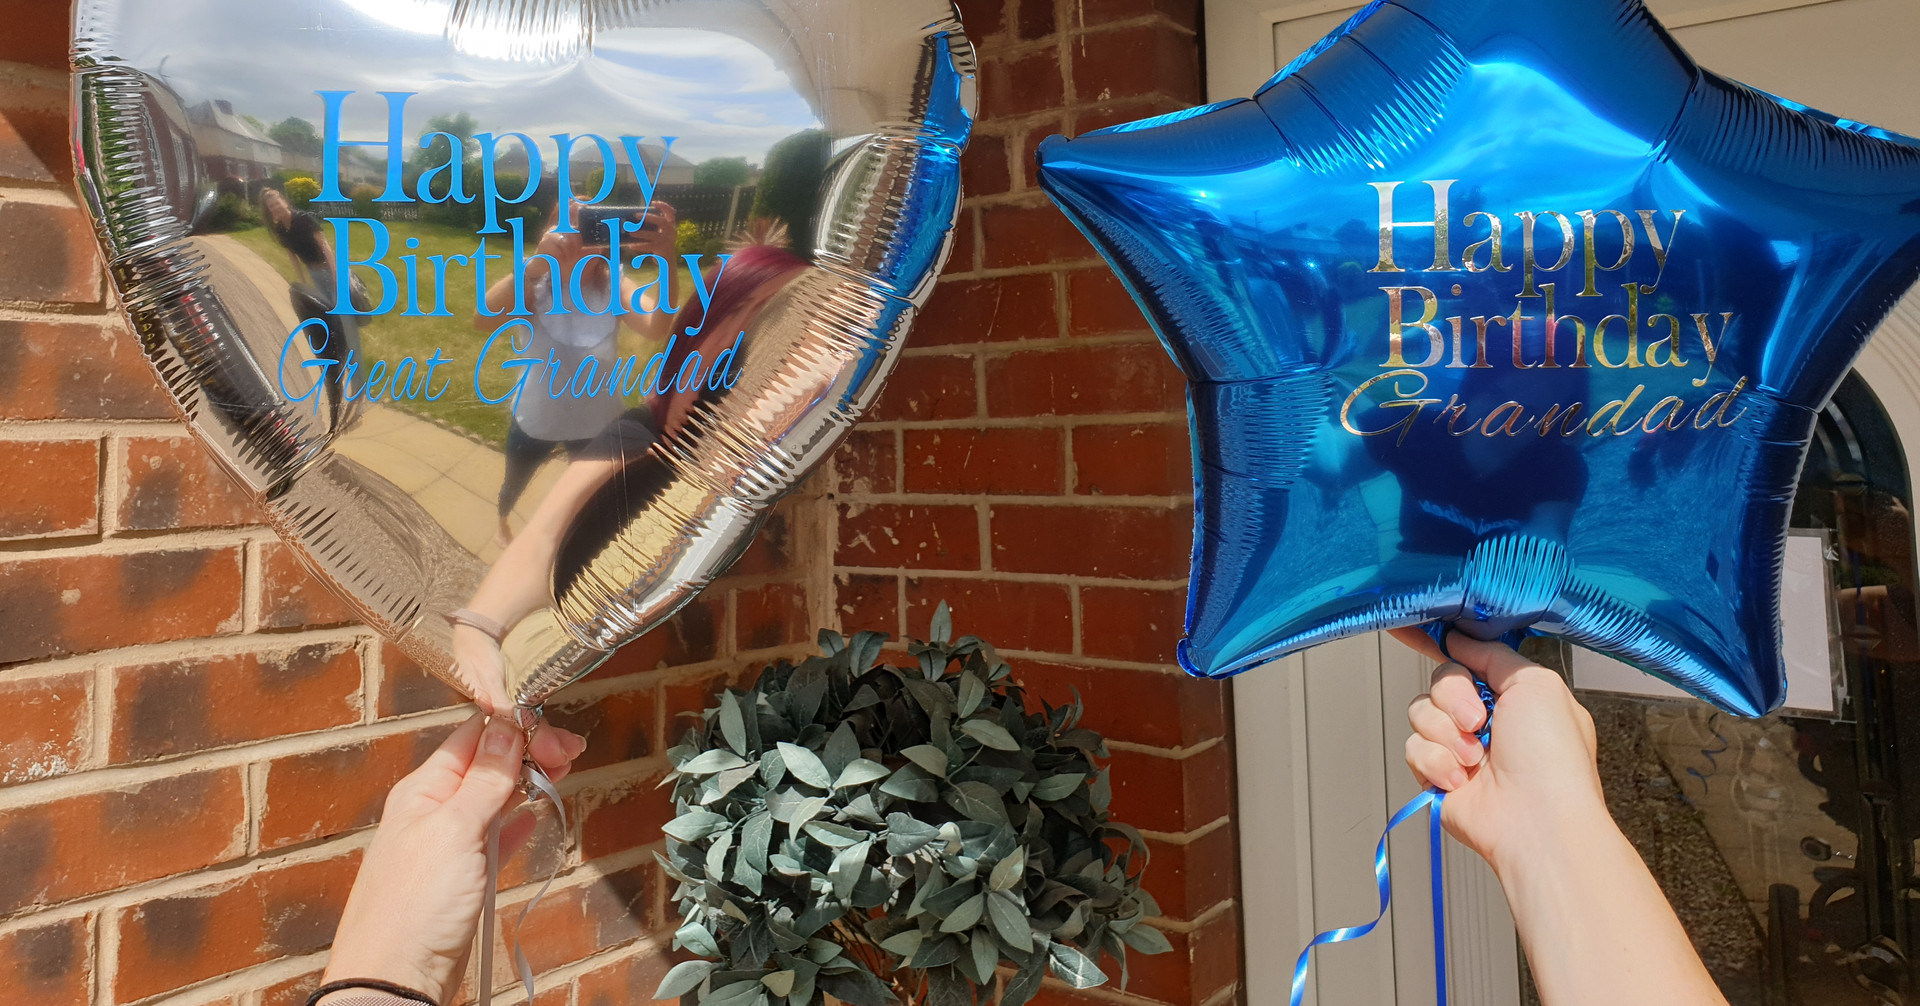 Silver heart & blue star foil balloon